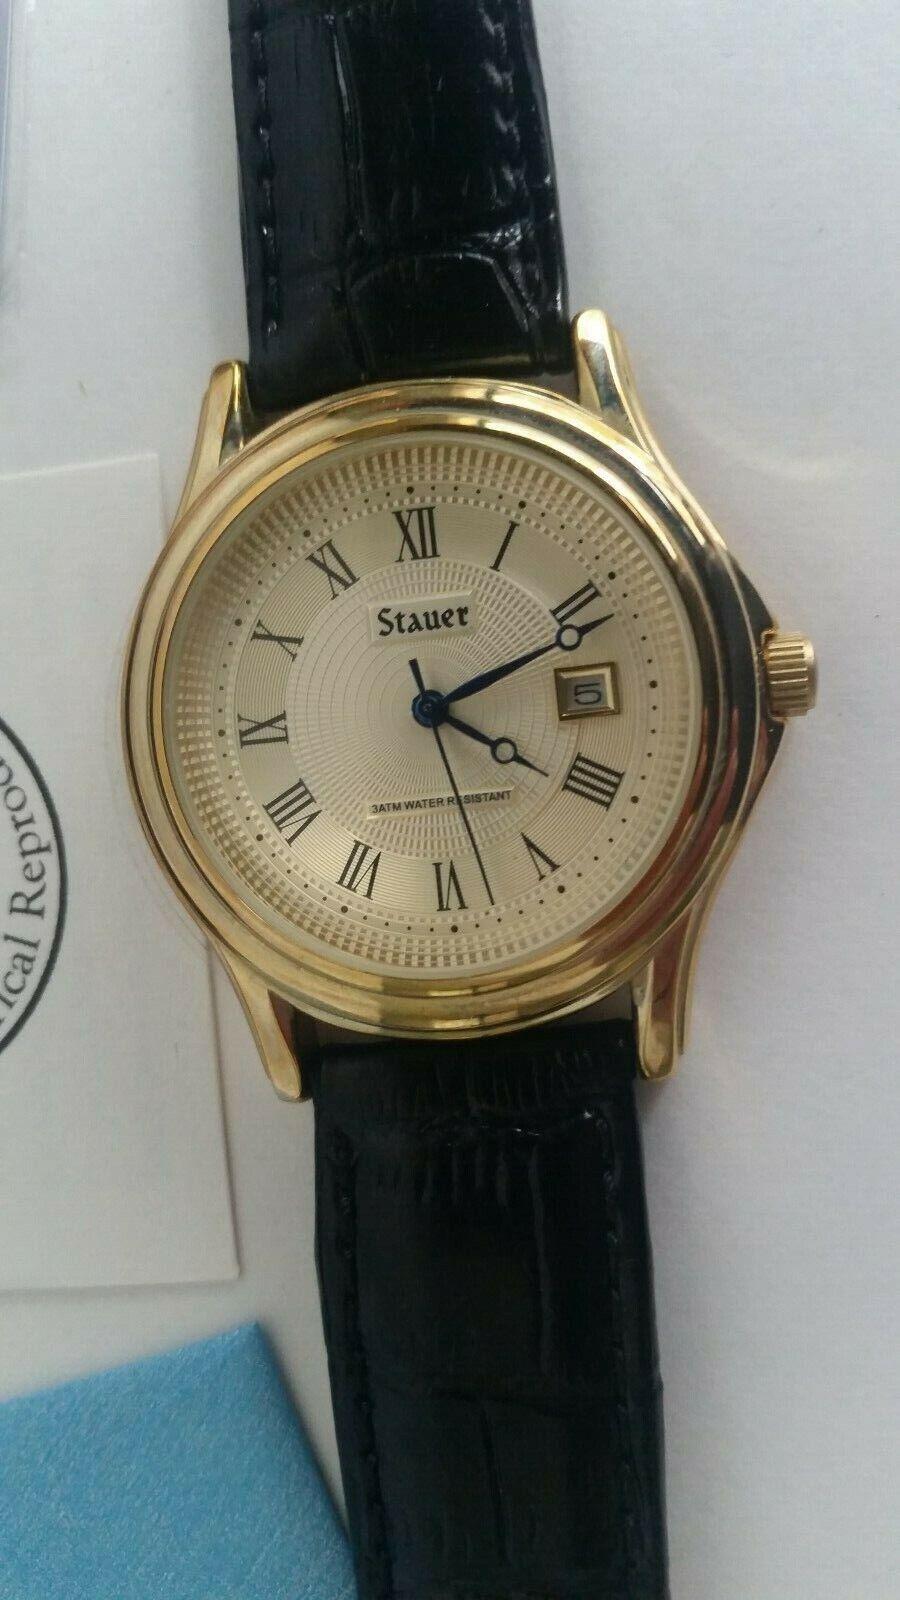 Stauer Metropolitan Historical Reproduction Men's Watch in B